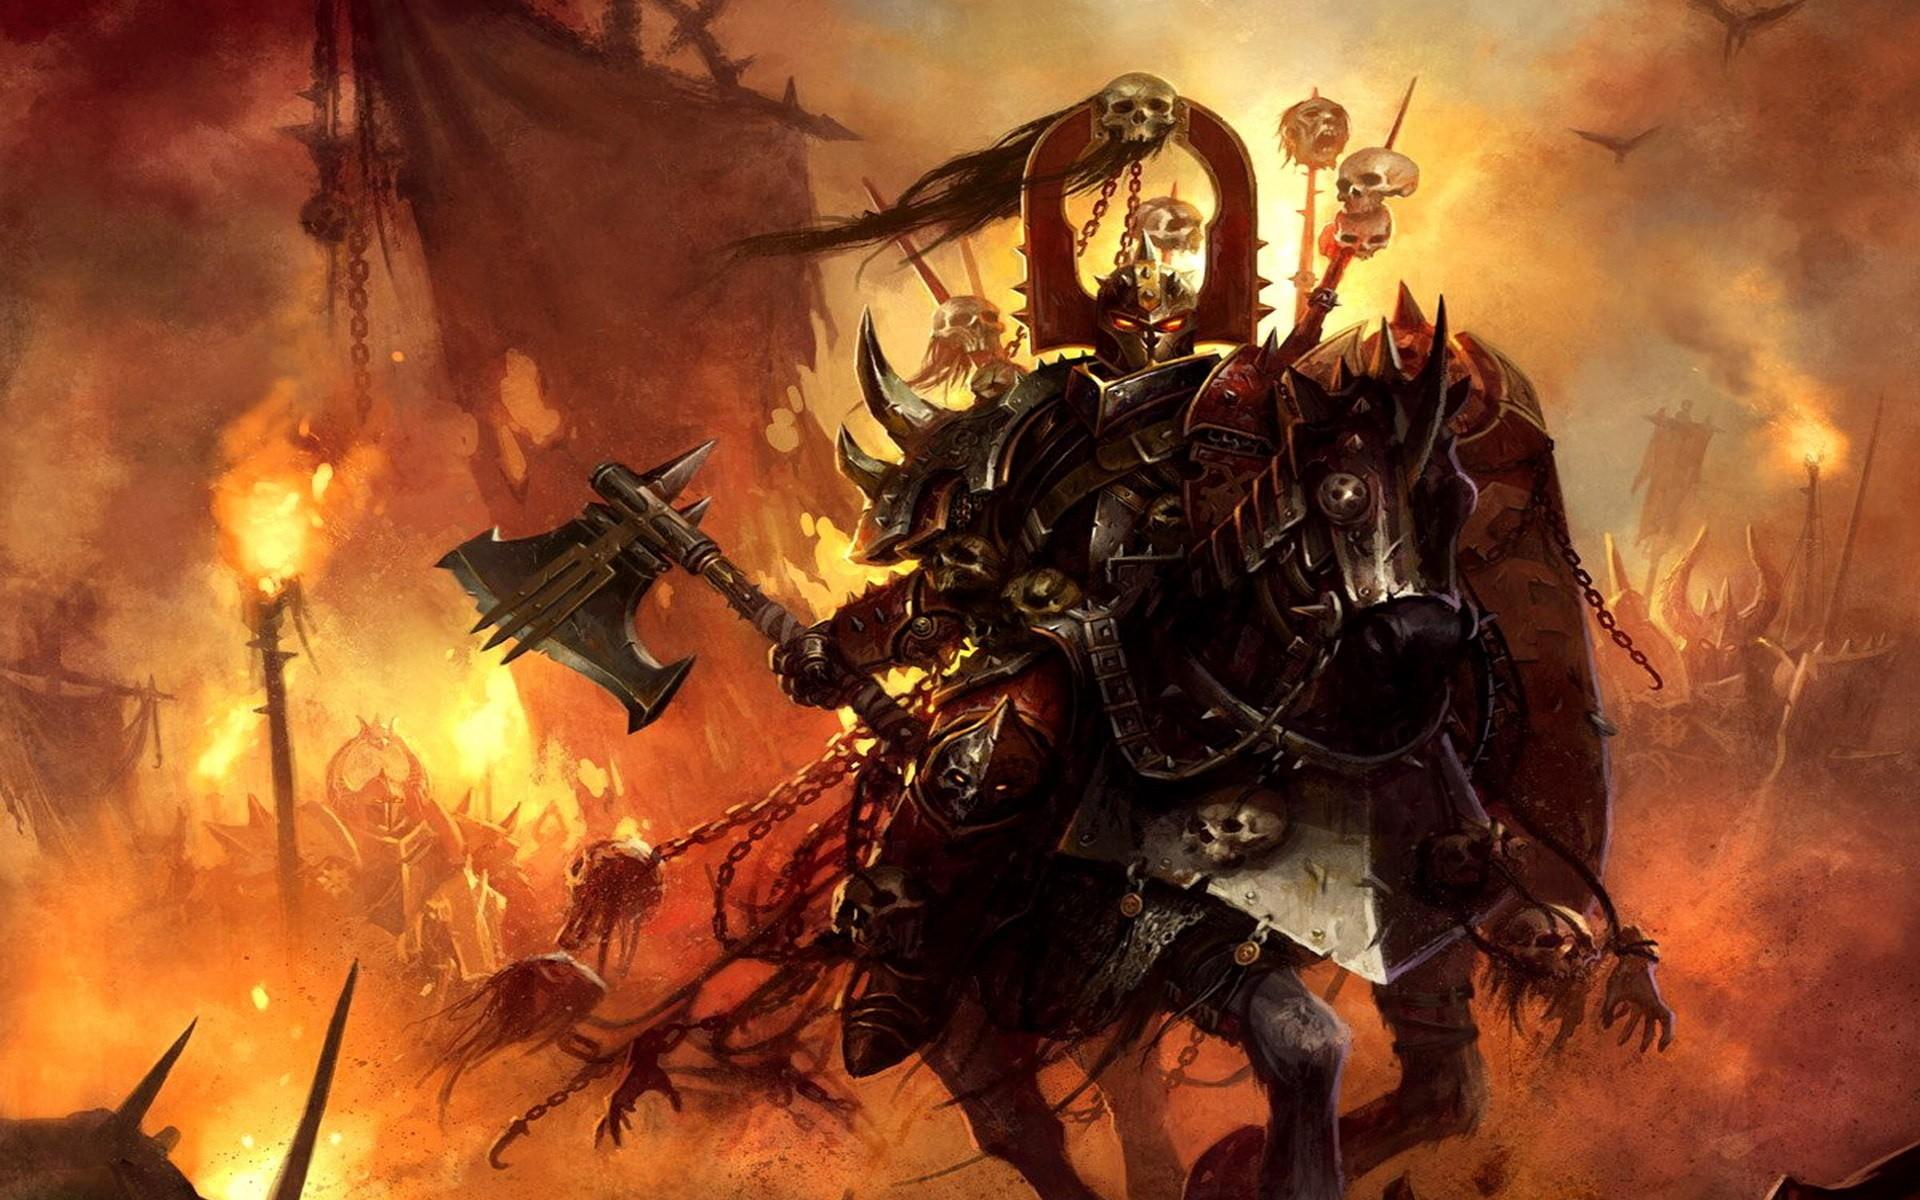 Creature of Hell Digital Art 1920x1200 hdweweb4com 1920x1200